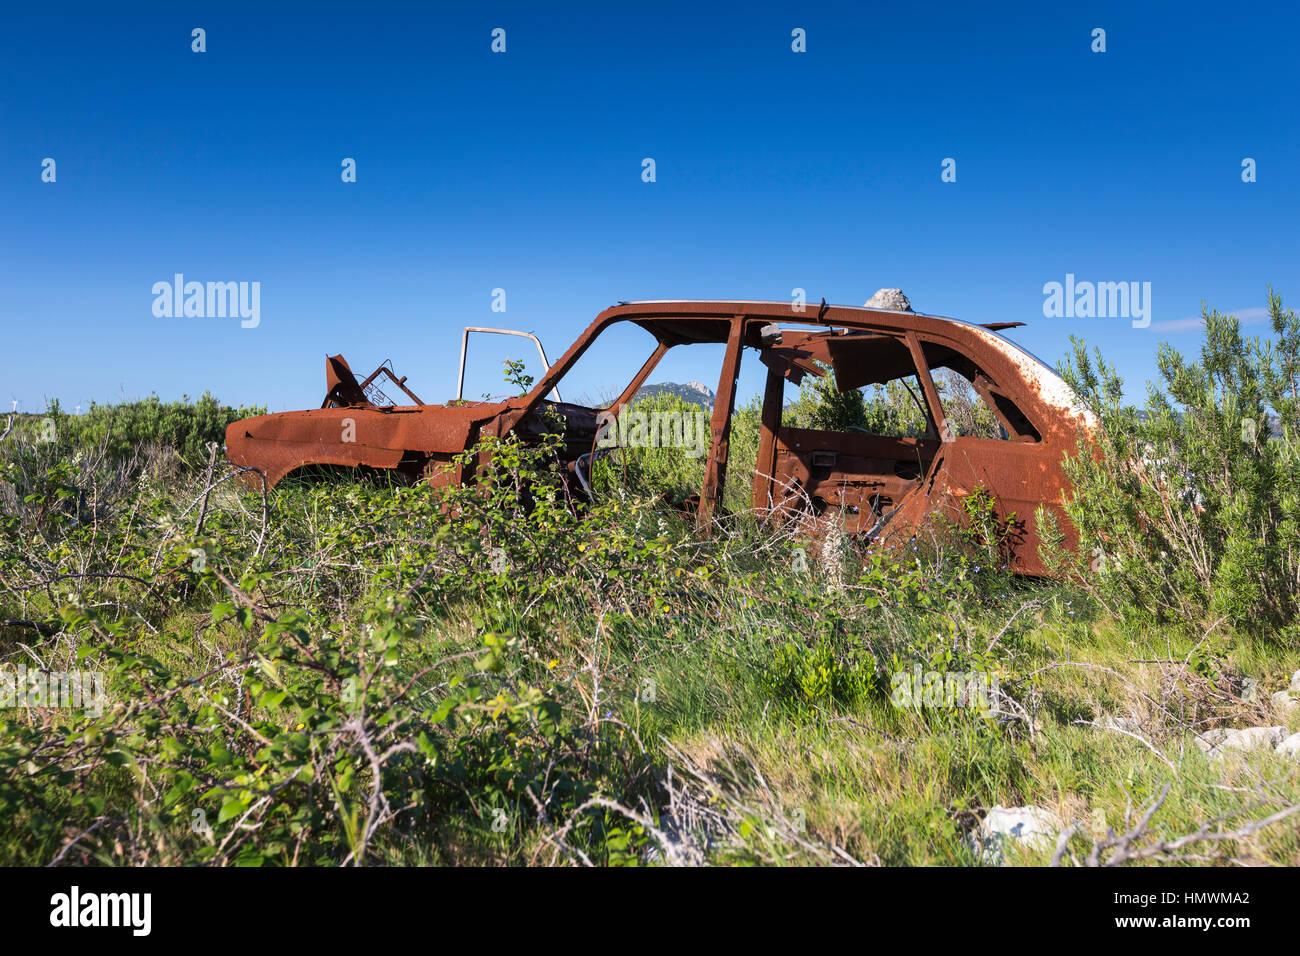 Landscape view of burnt out car amongst heathland vegetation, Feuilla Plateau, Aude, France in June 2016. Stock Photo